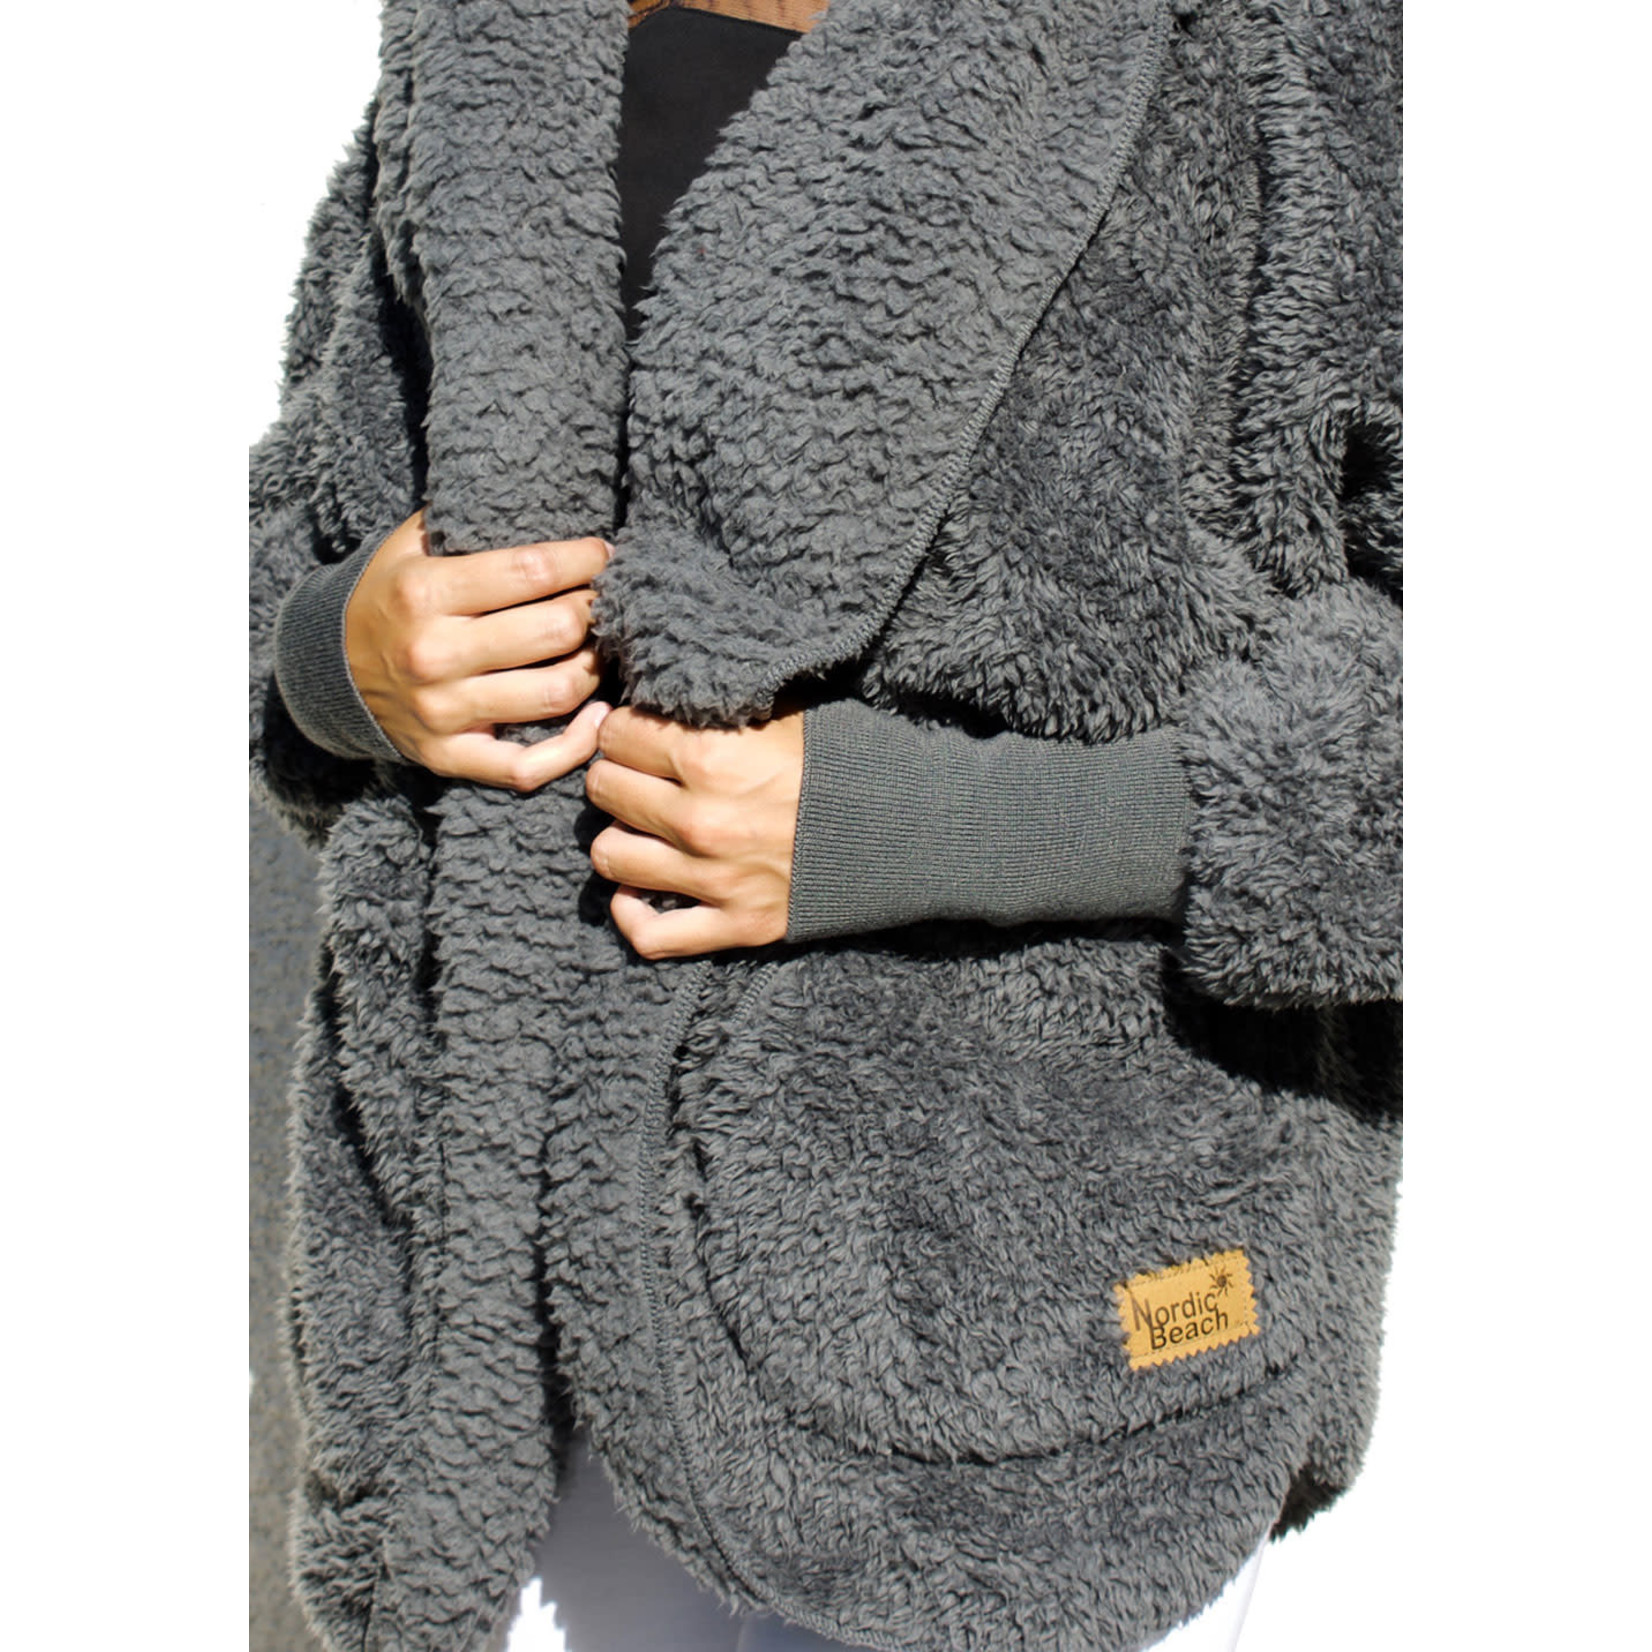 Nordic Beach Fuzzy Fleece Hooded Cardigan in Koala Grey